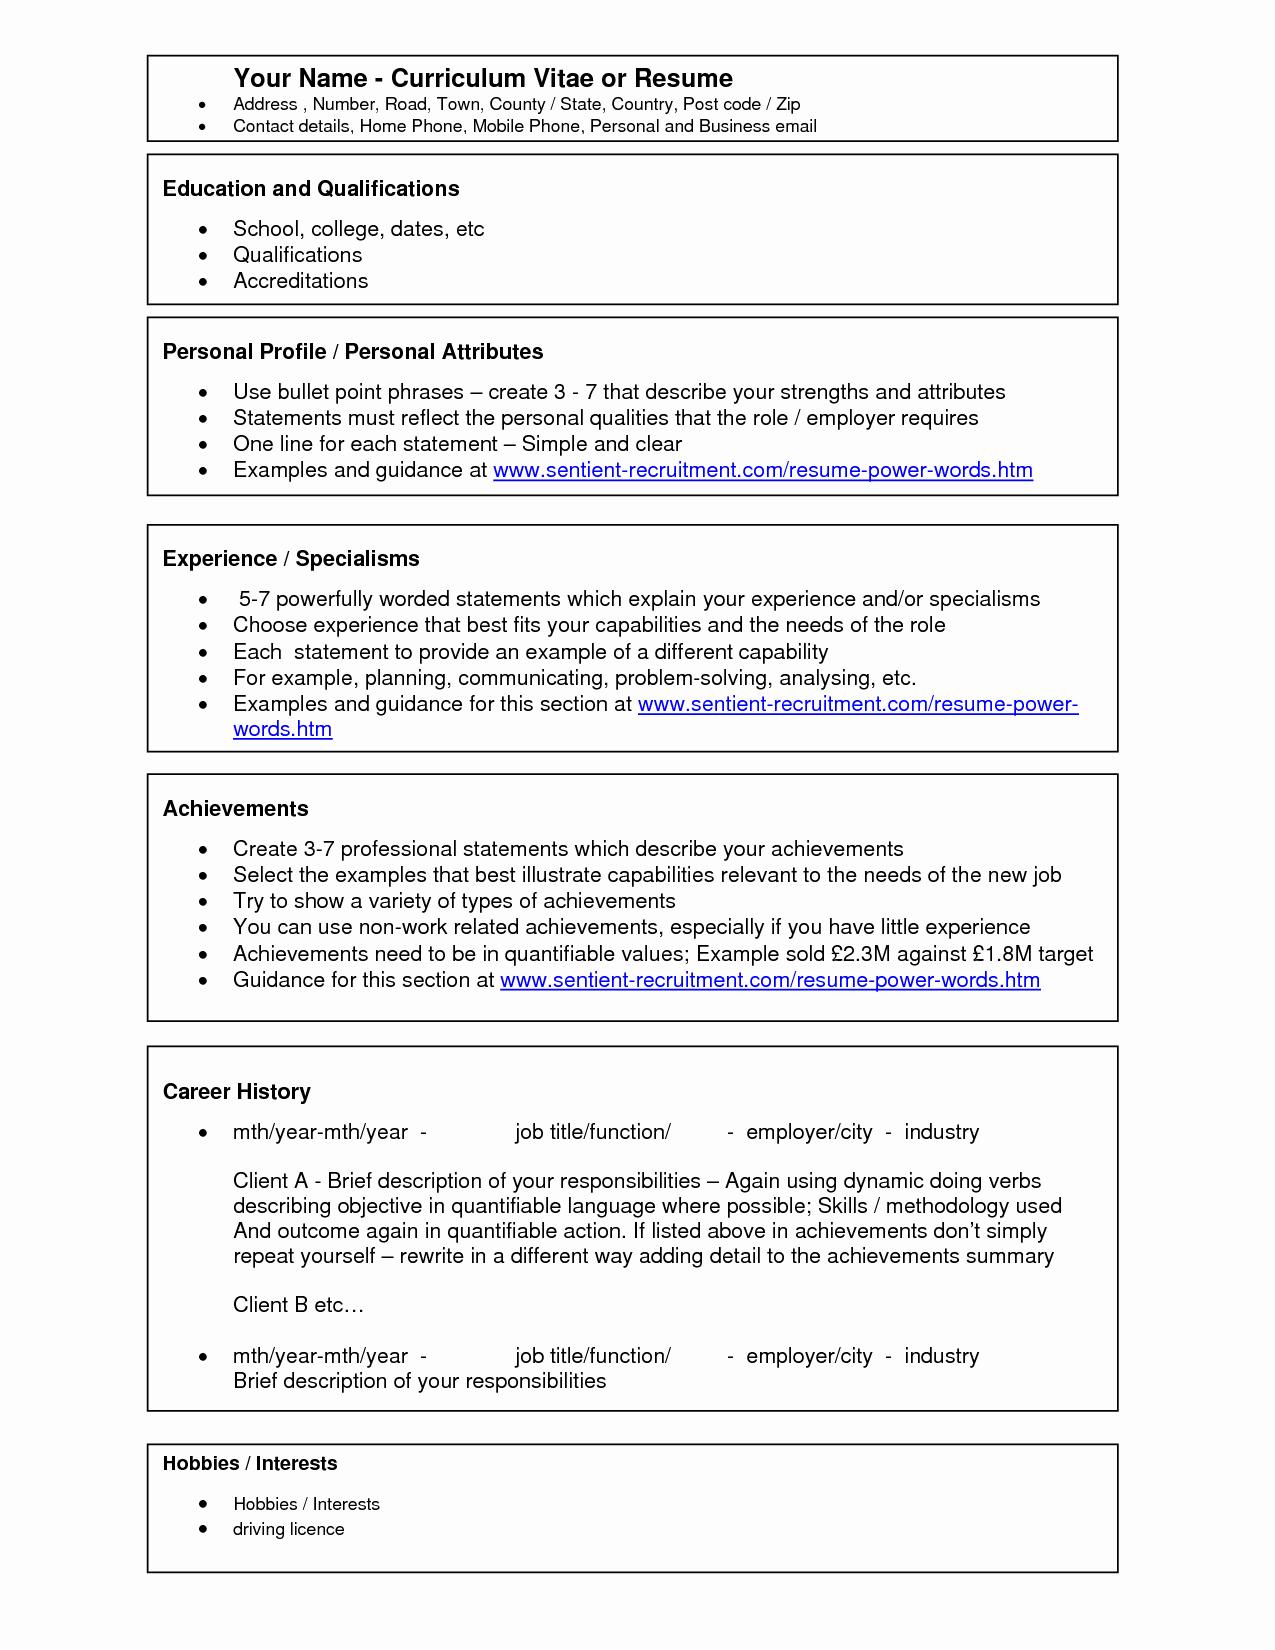 Resume Template Download Microsoft Word Elegant Pic Scope Of Work Template